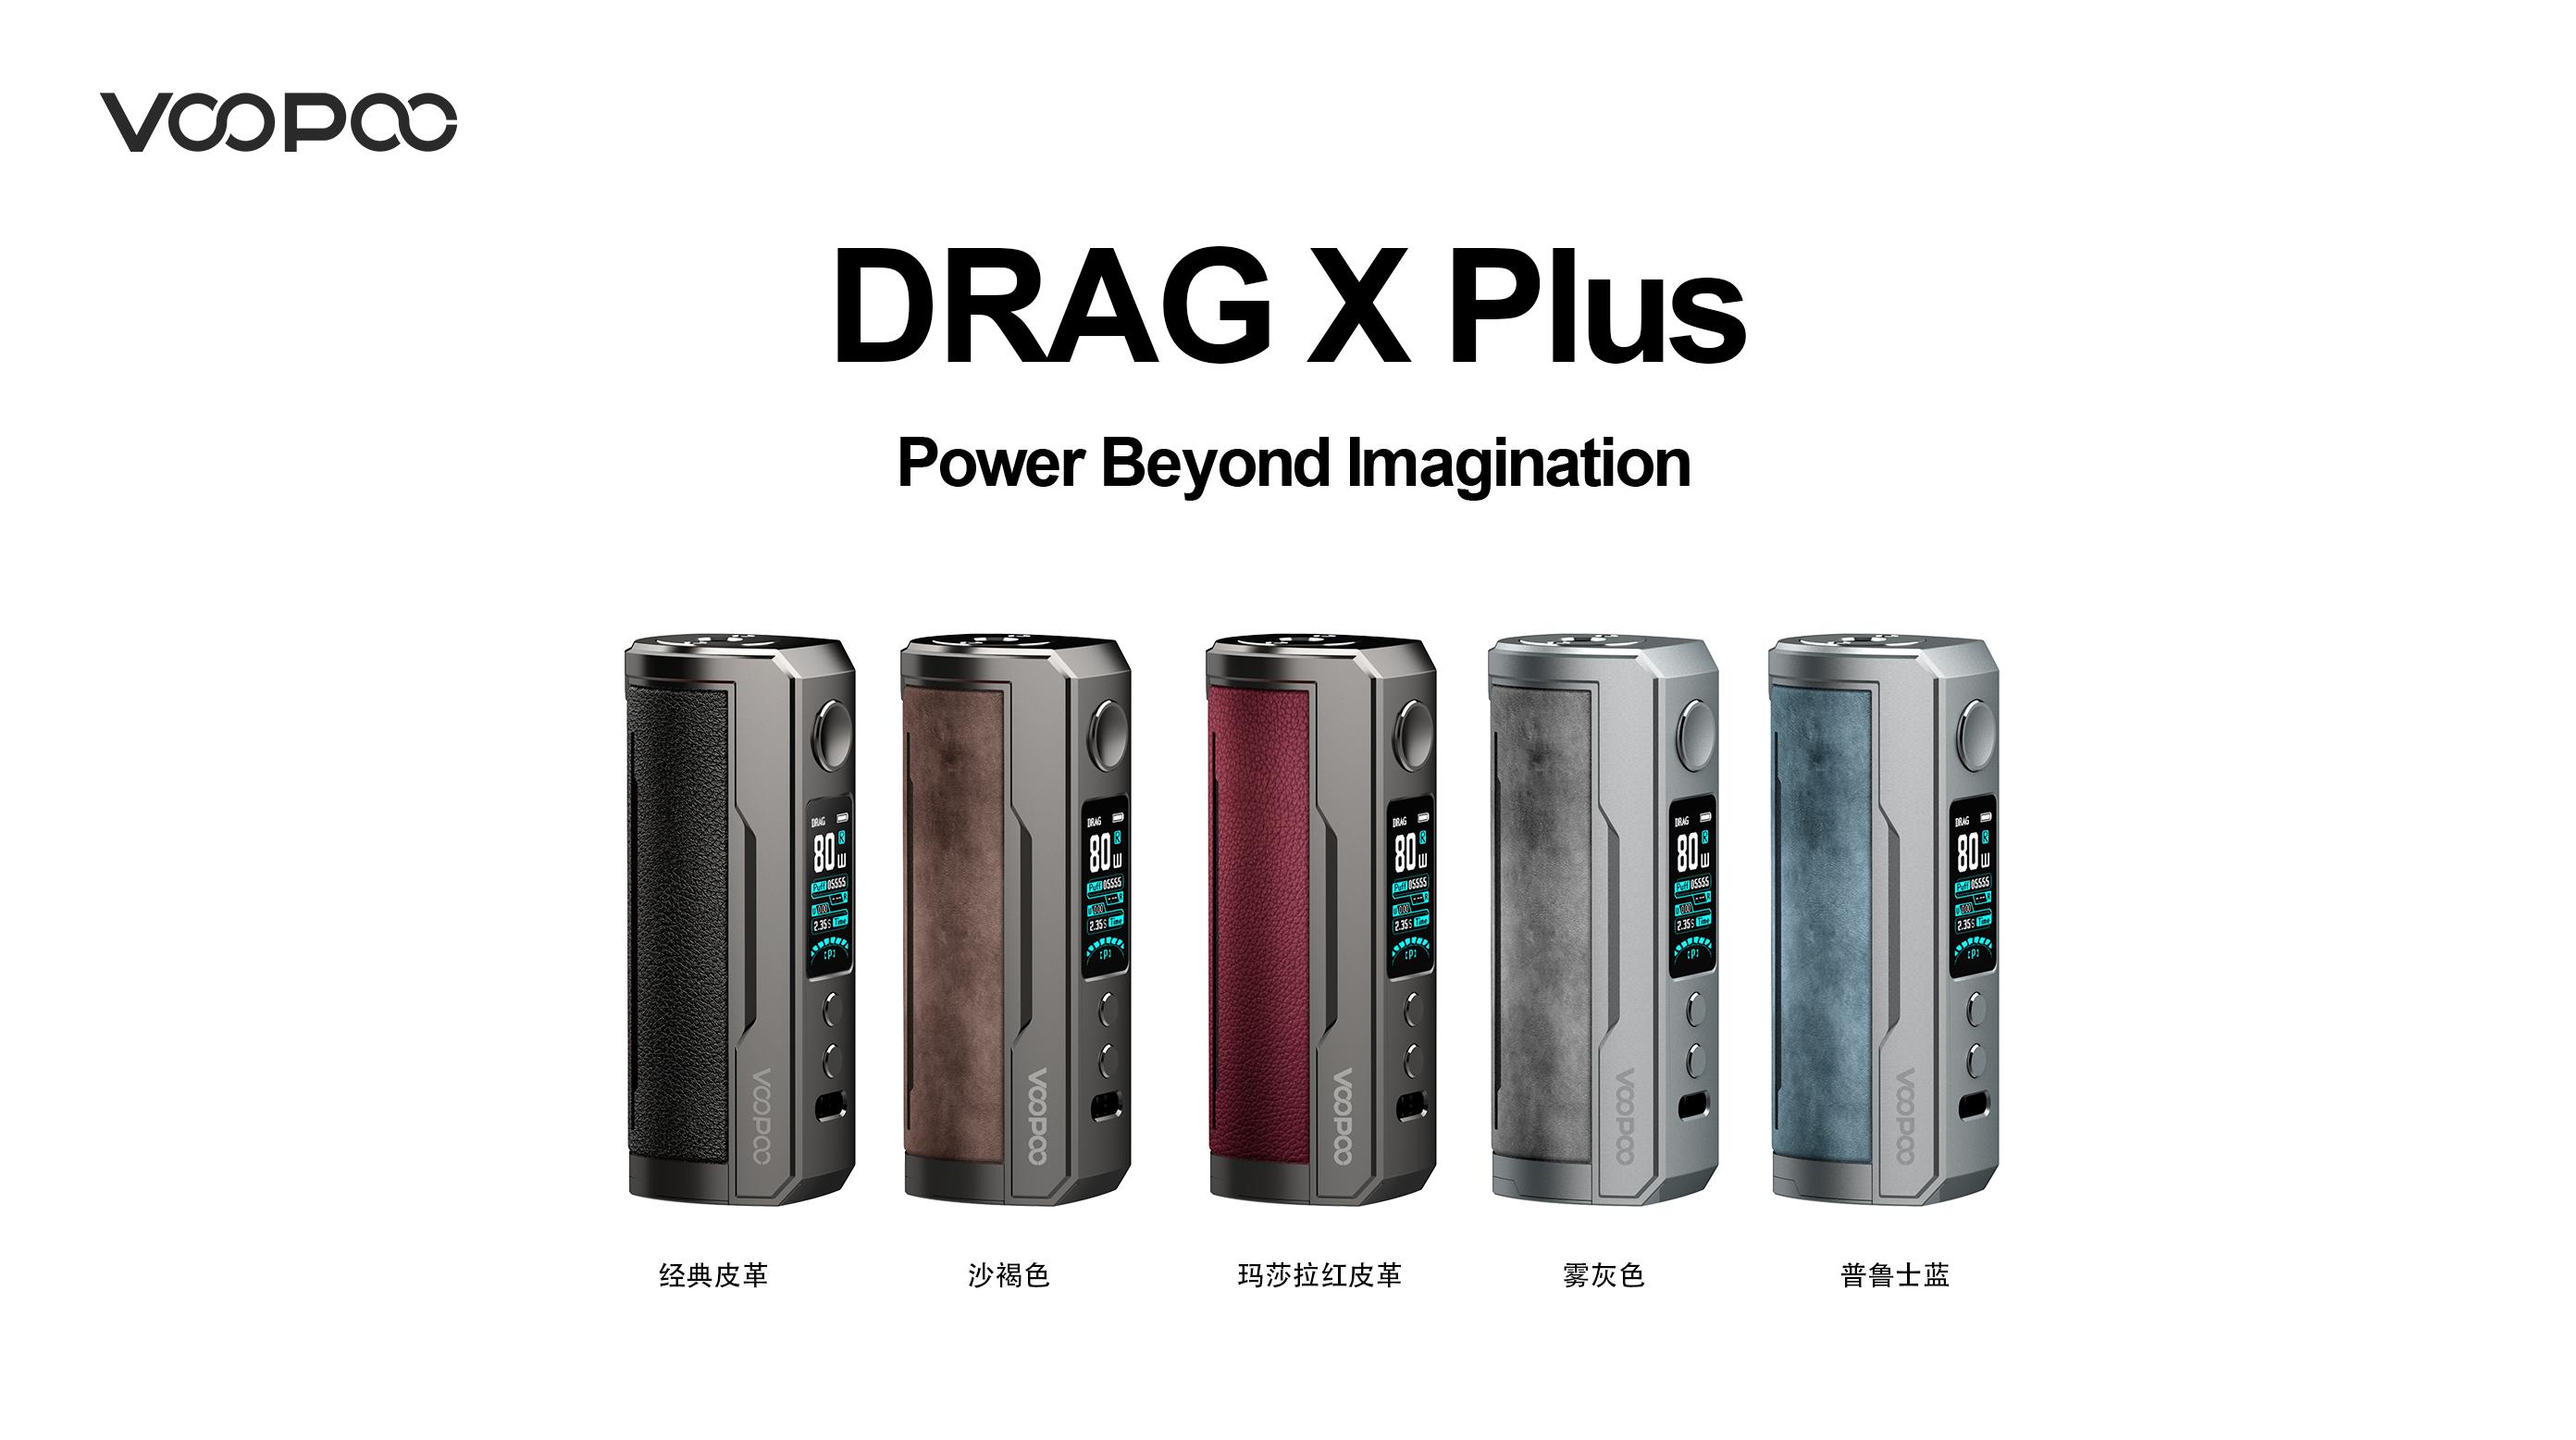 VOOPOO_DRAG-X-Plus_BOX_MOD_Color-Frame_CN (1)